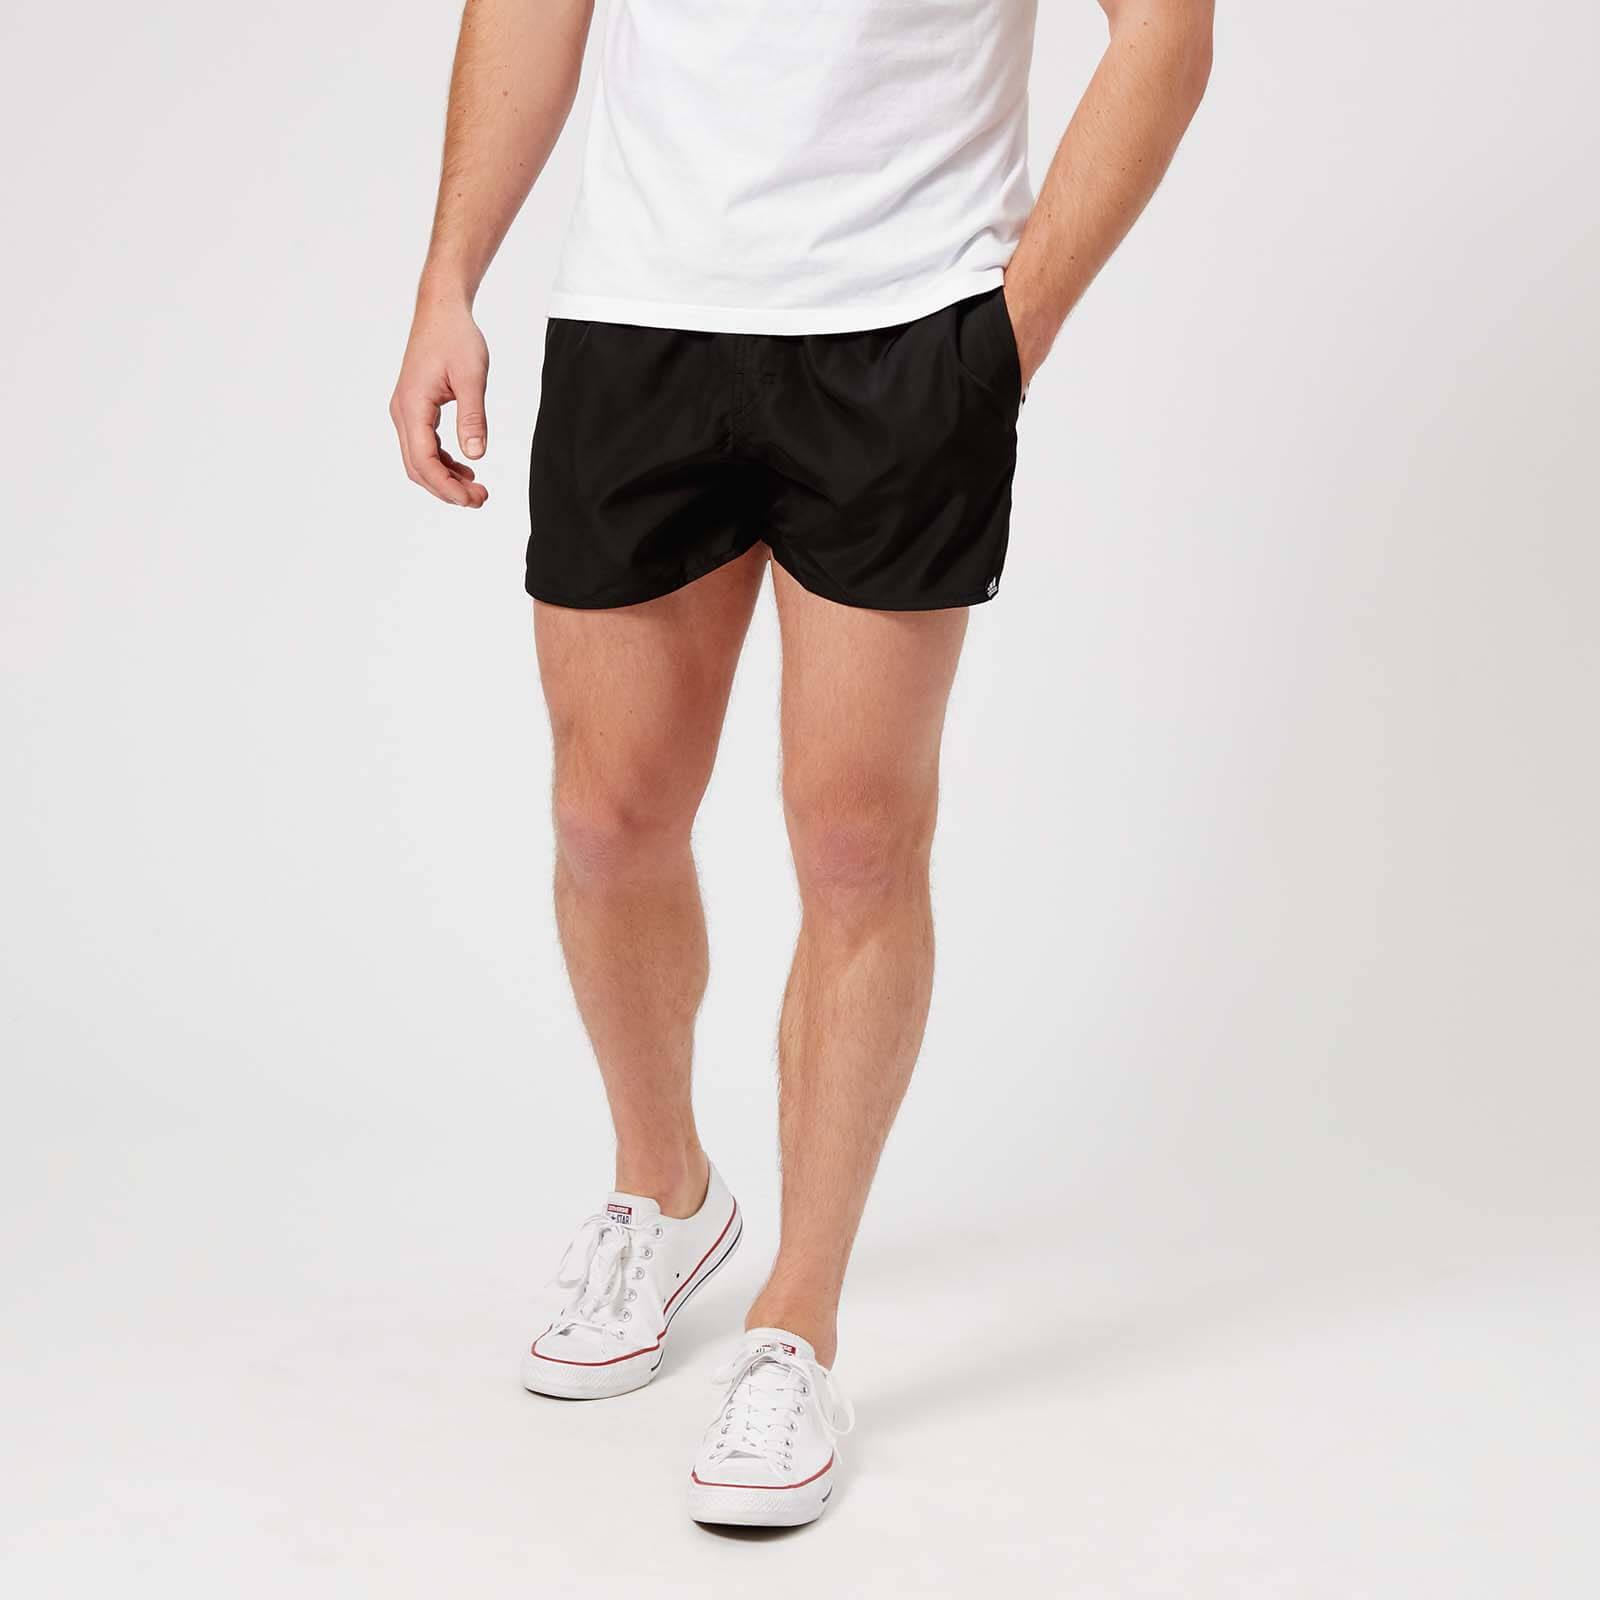 48555f2a165e5 adidas Men's 3 Stripe VSL Swim Shorts - Black Sports & Leisure   TheHut.com